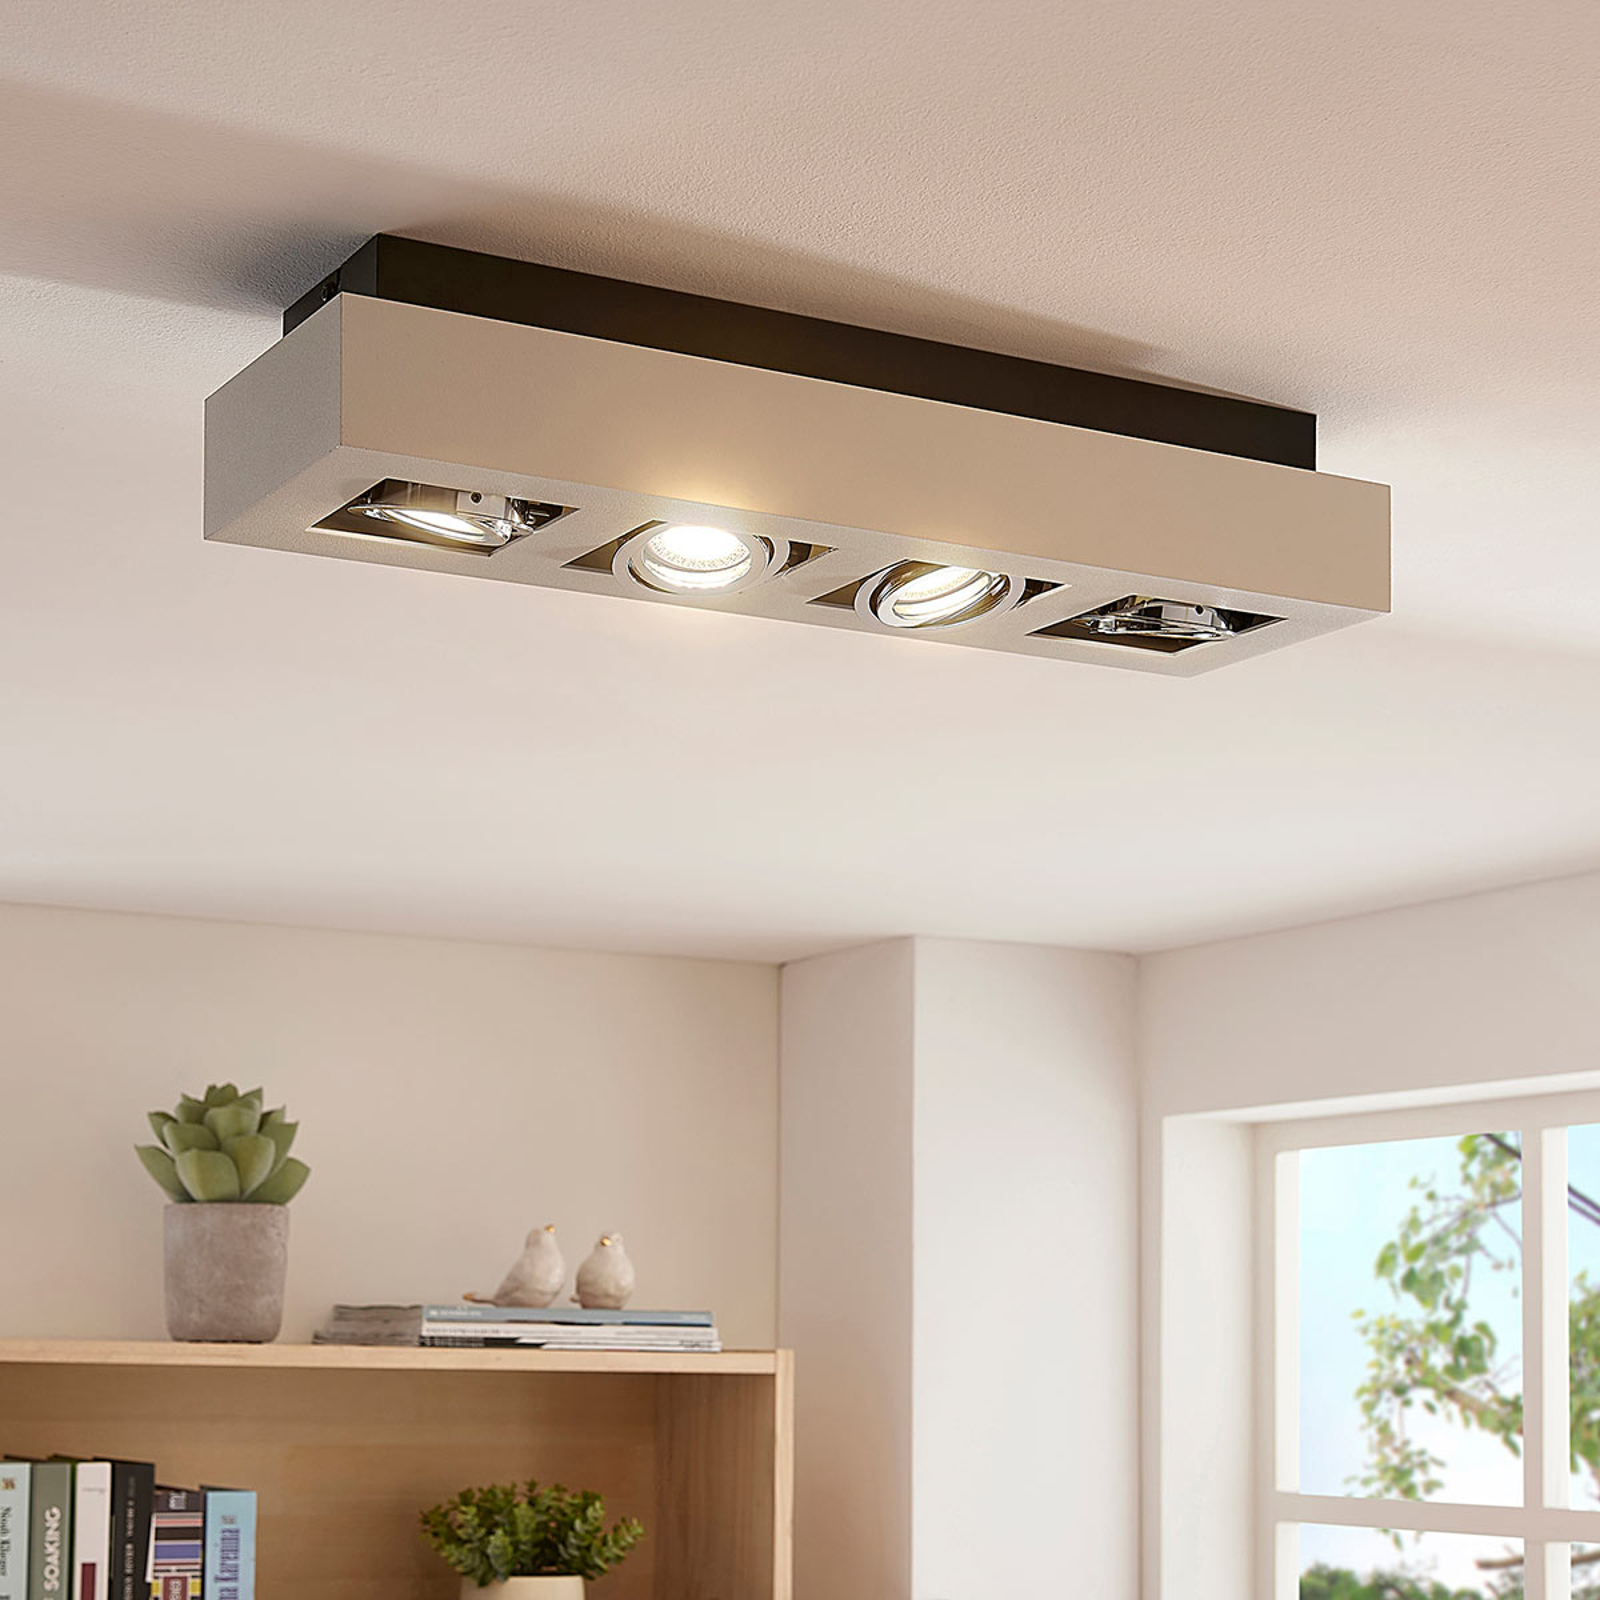 Podłużna lampa sufitowa LED VINCE, biała, 4-pkt.